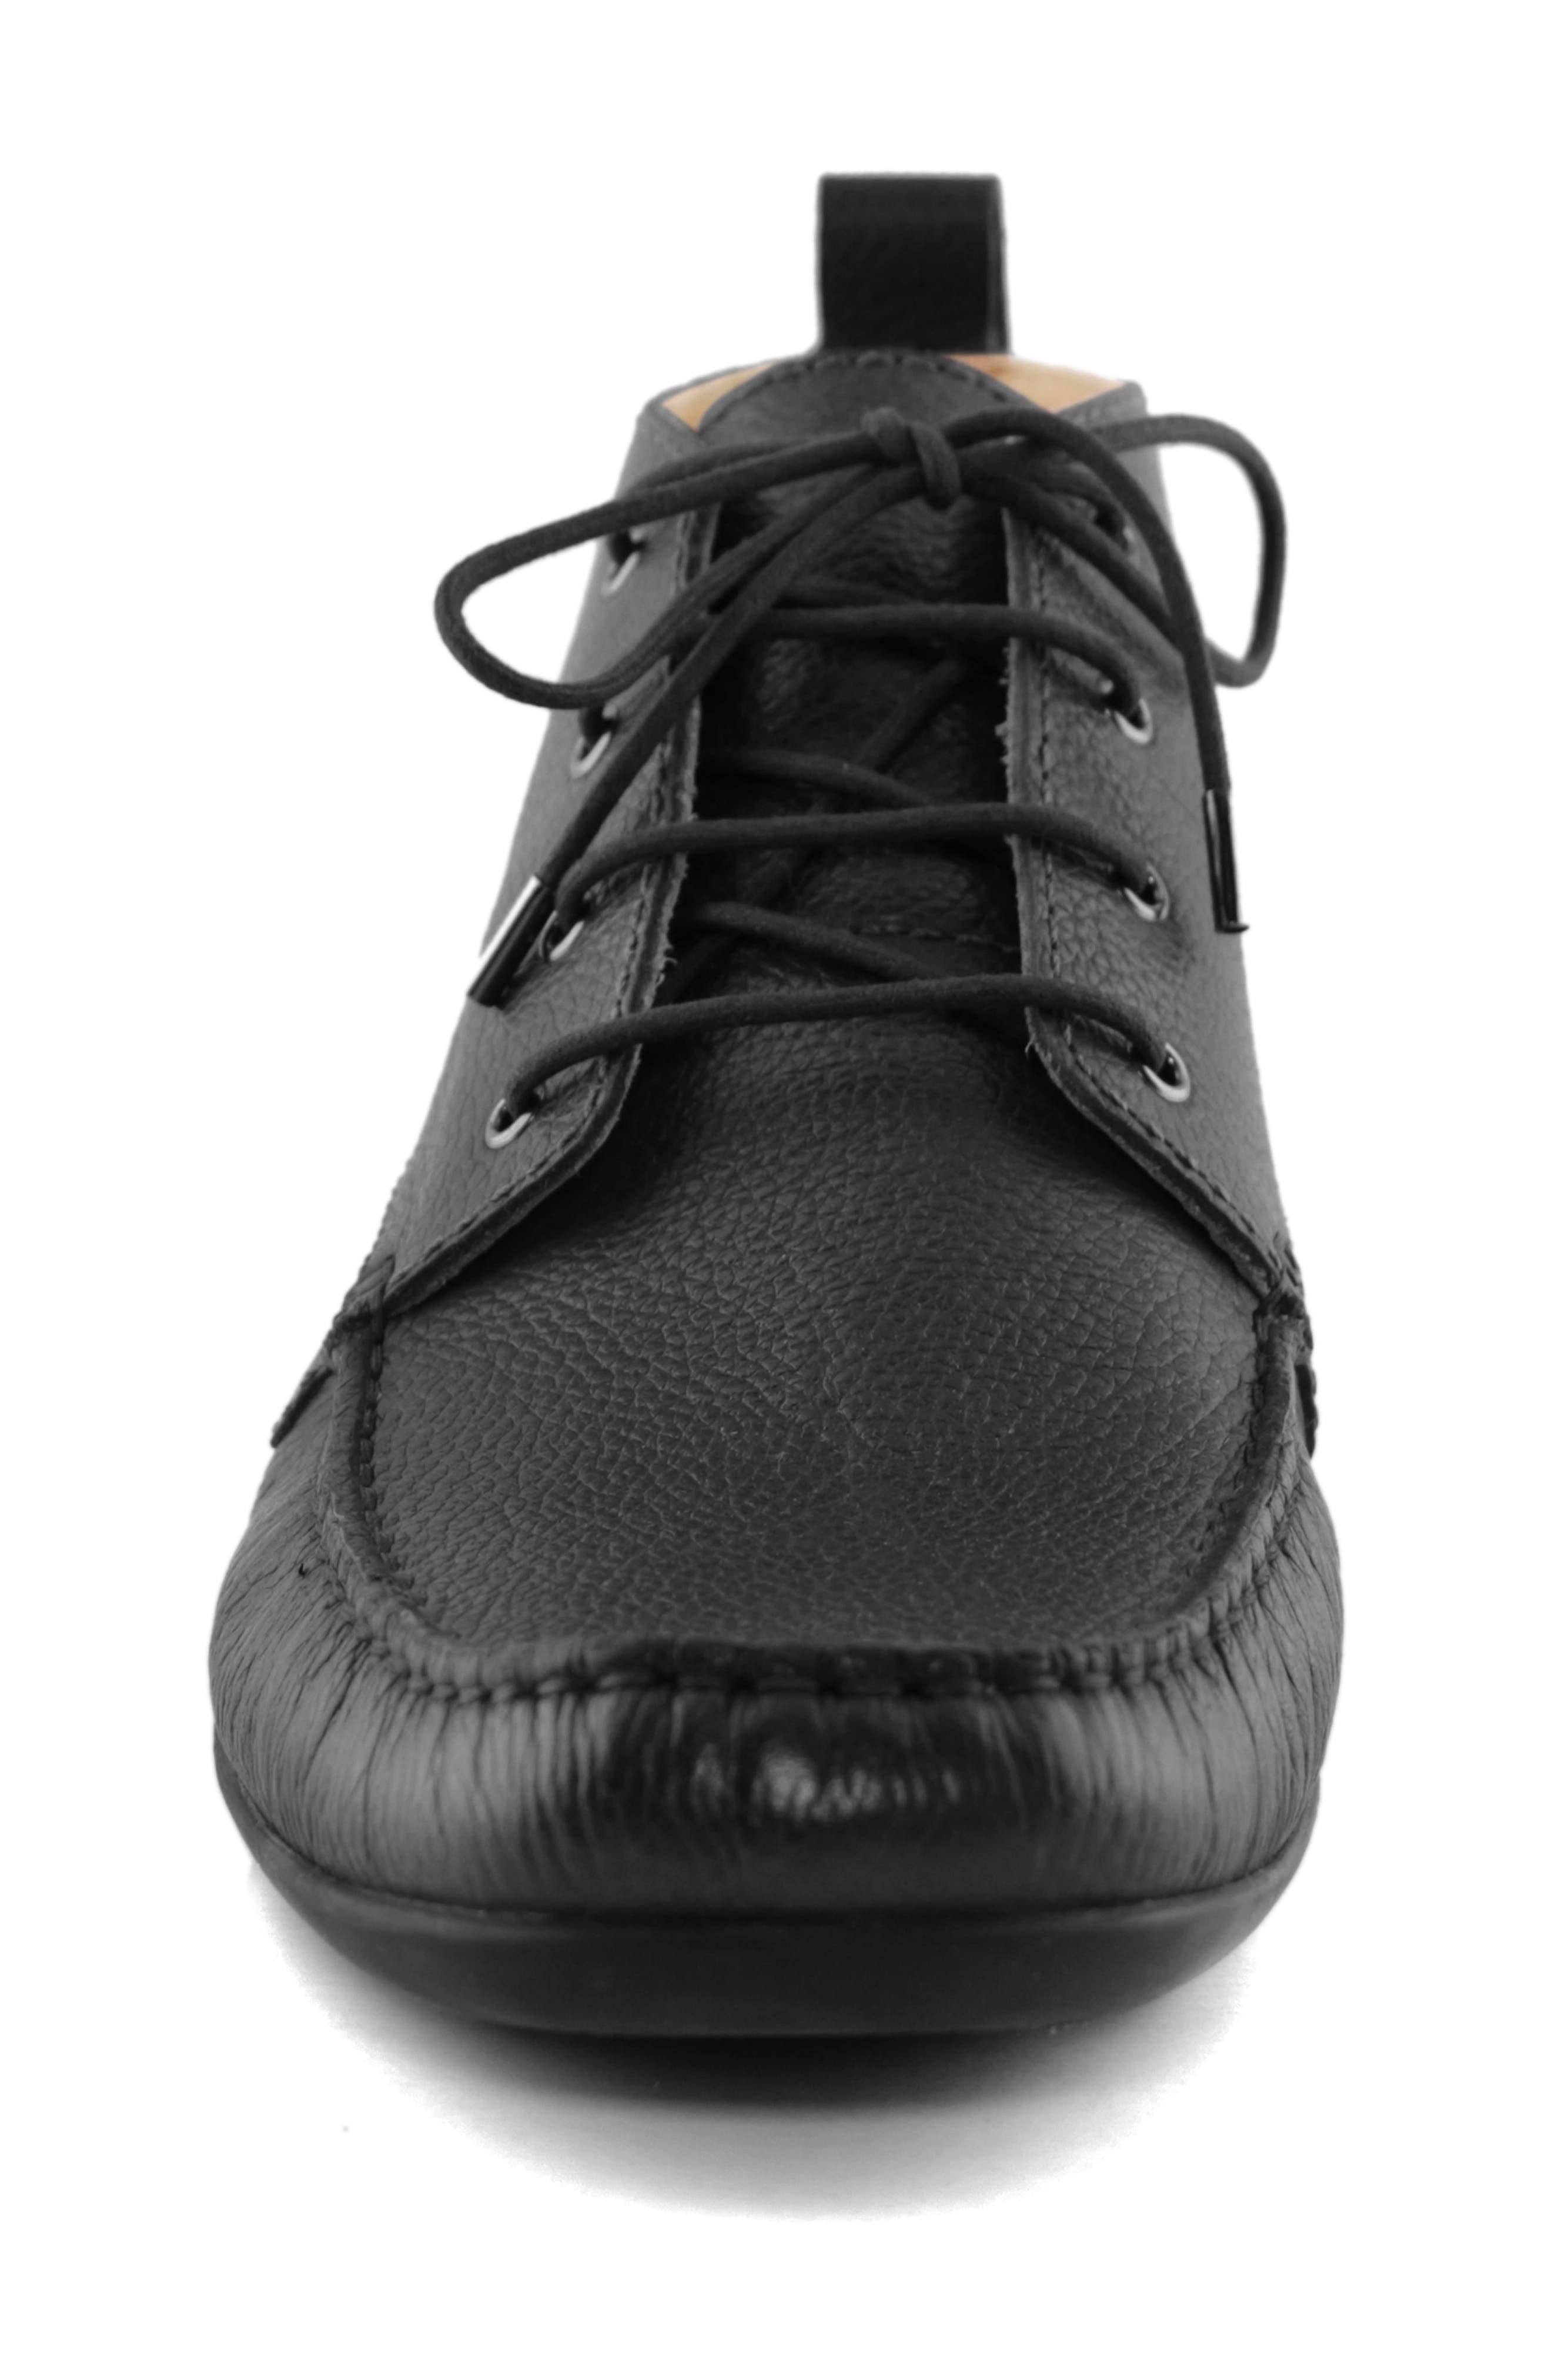 MARC JOSEPH NEW YORK, Soho Boot 2 Chukka Boot, Alternate thumbnail 4, color, BLACK LEATHER